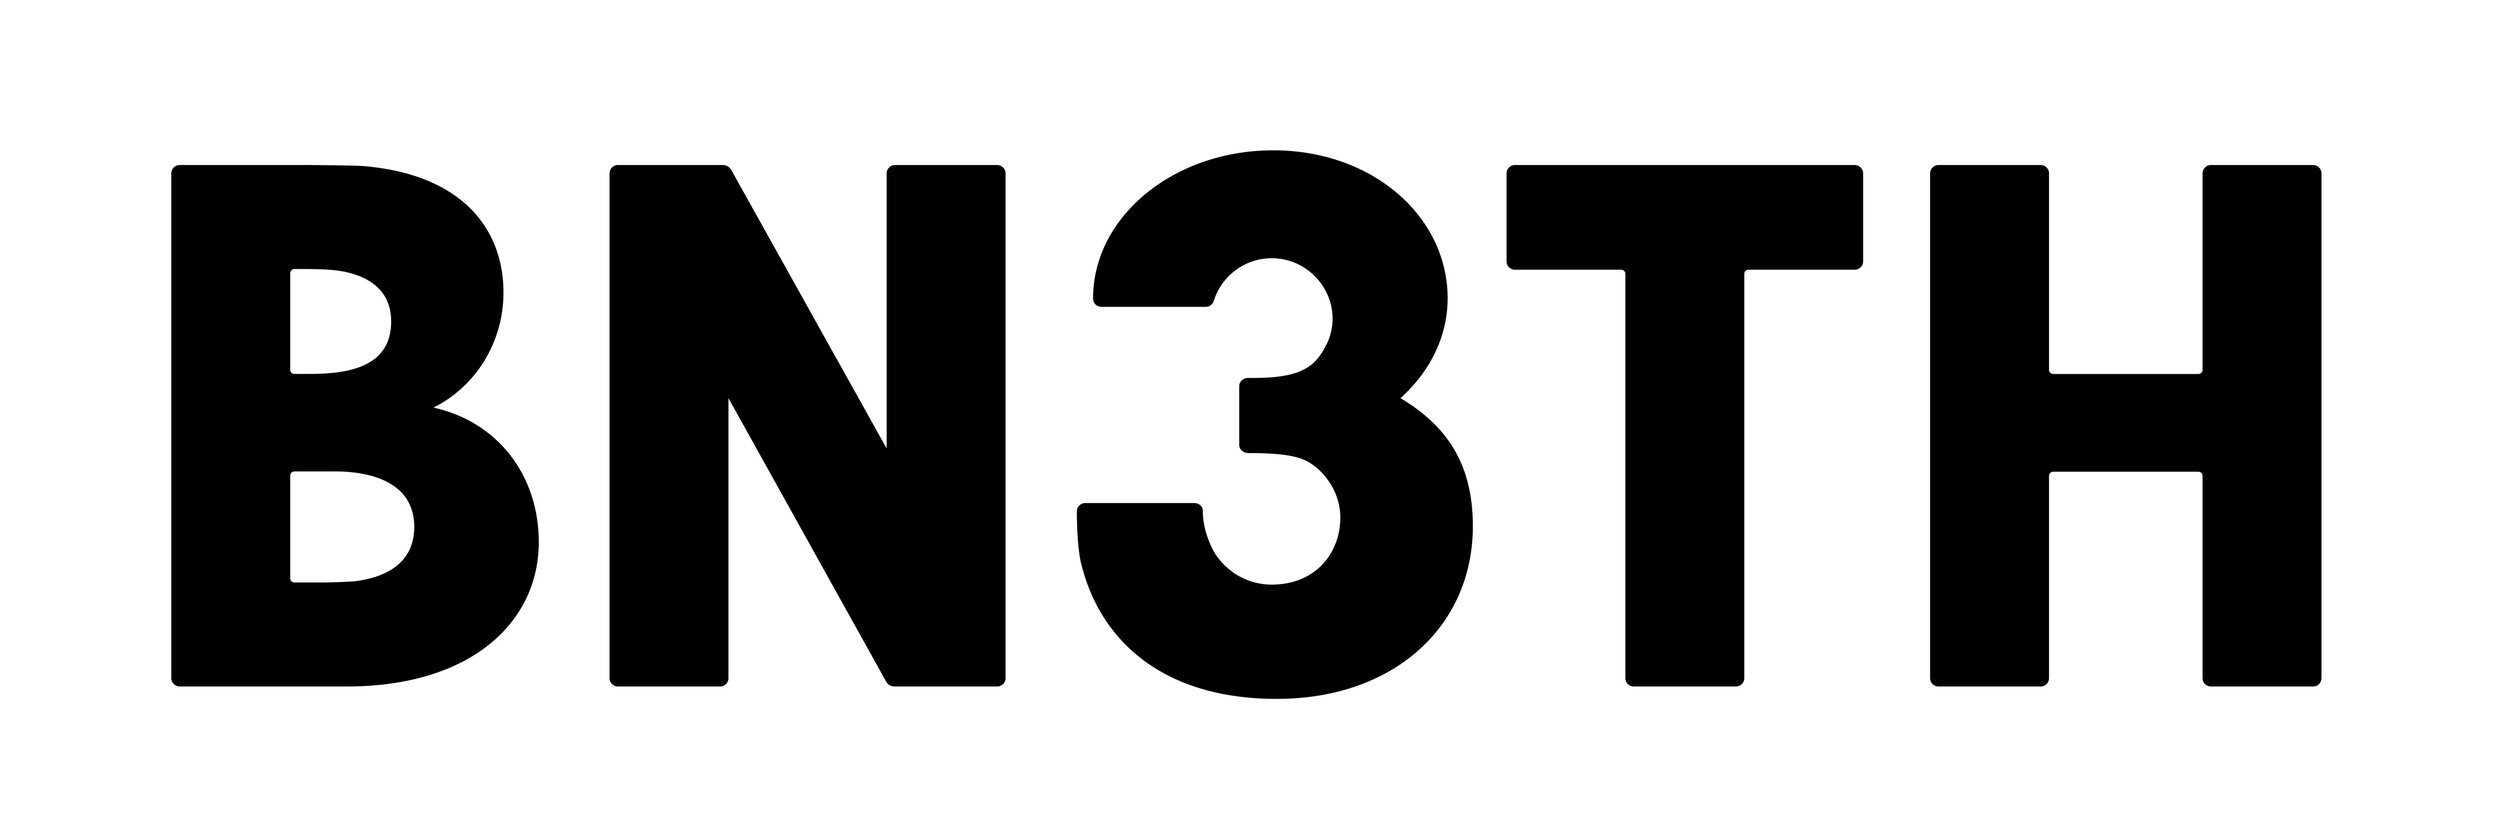 BN3TH_Black 2.jpg